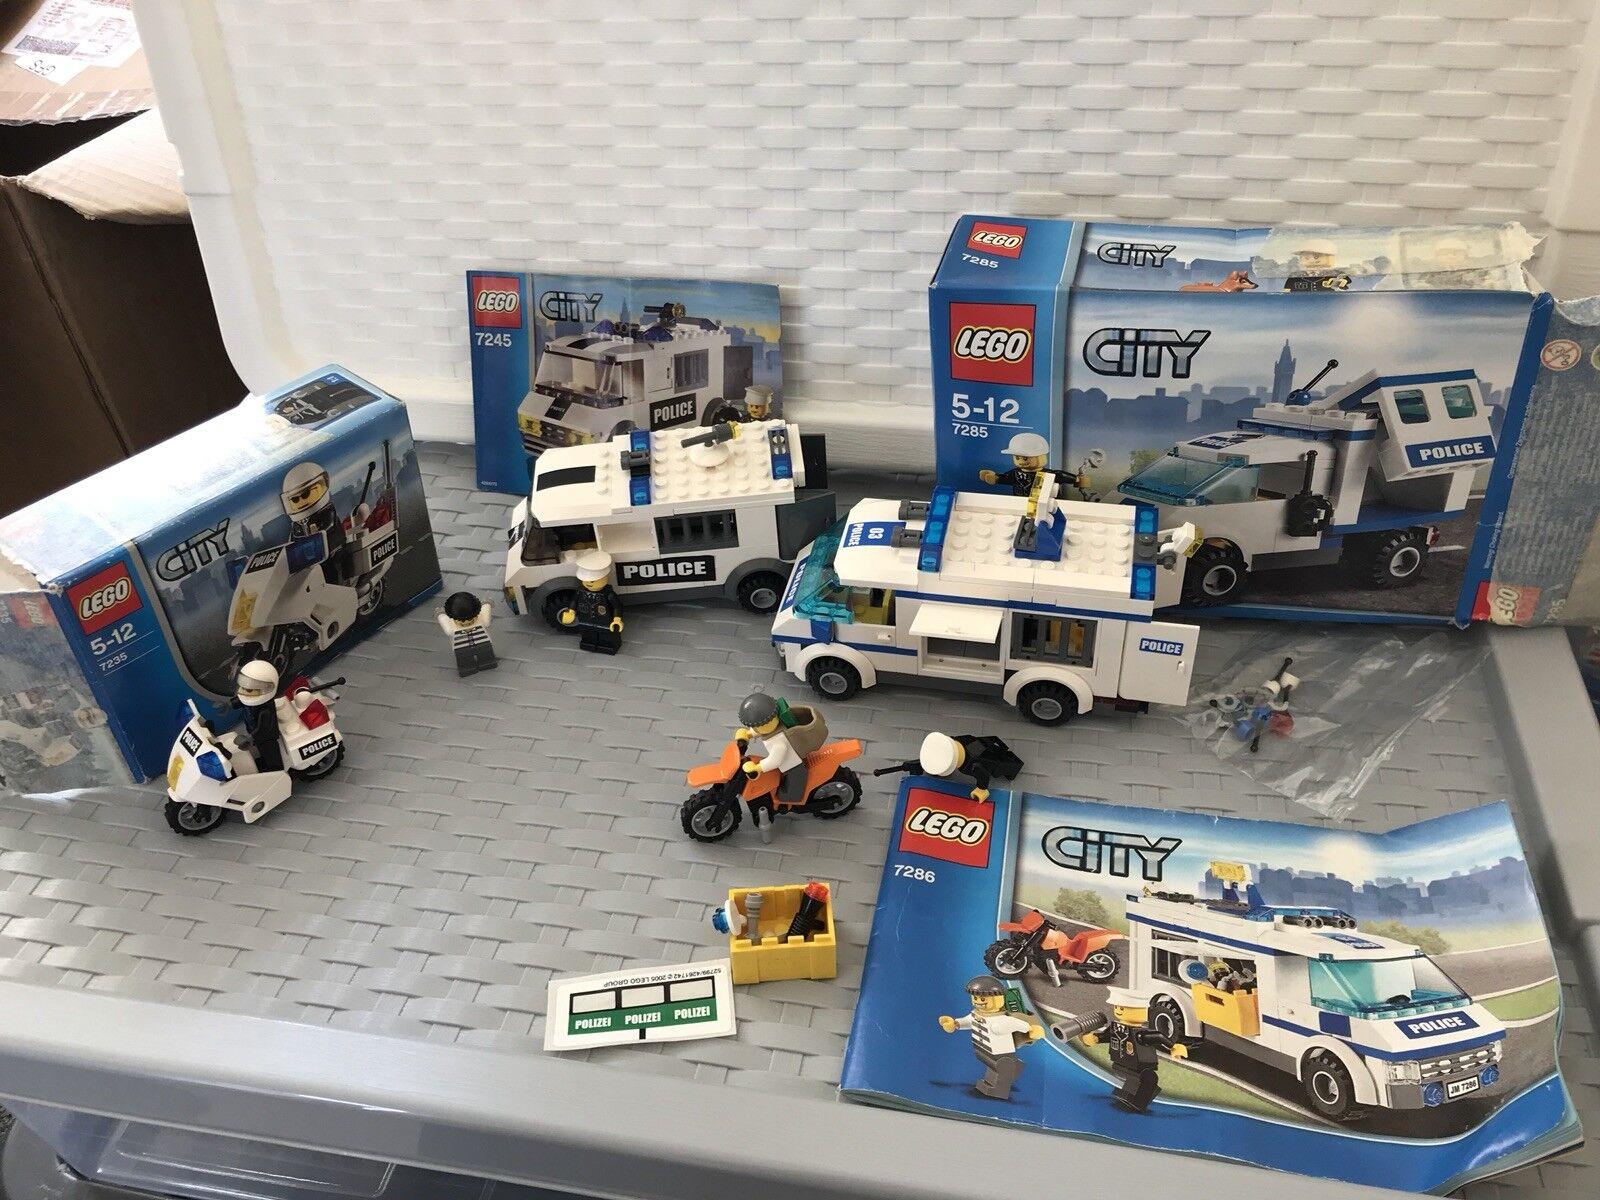 Lego City Police Retired Sets 7235 7245 7286